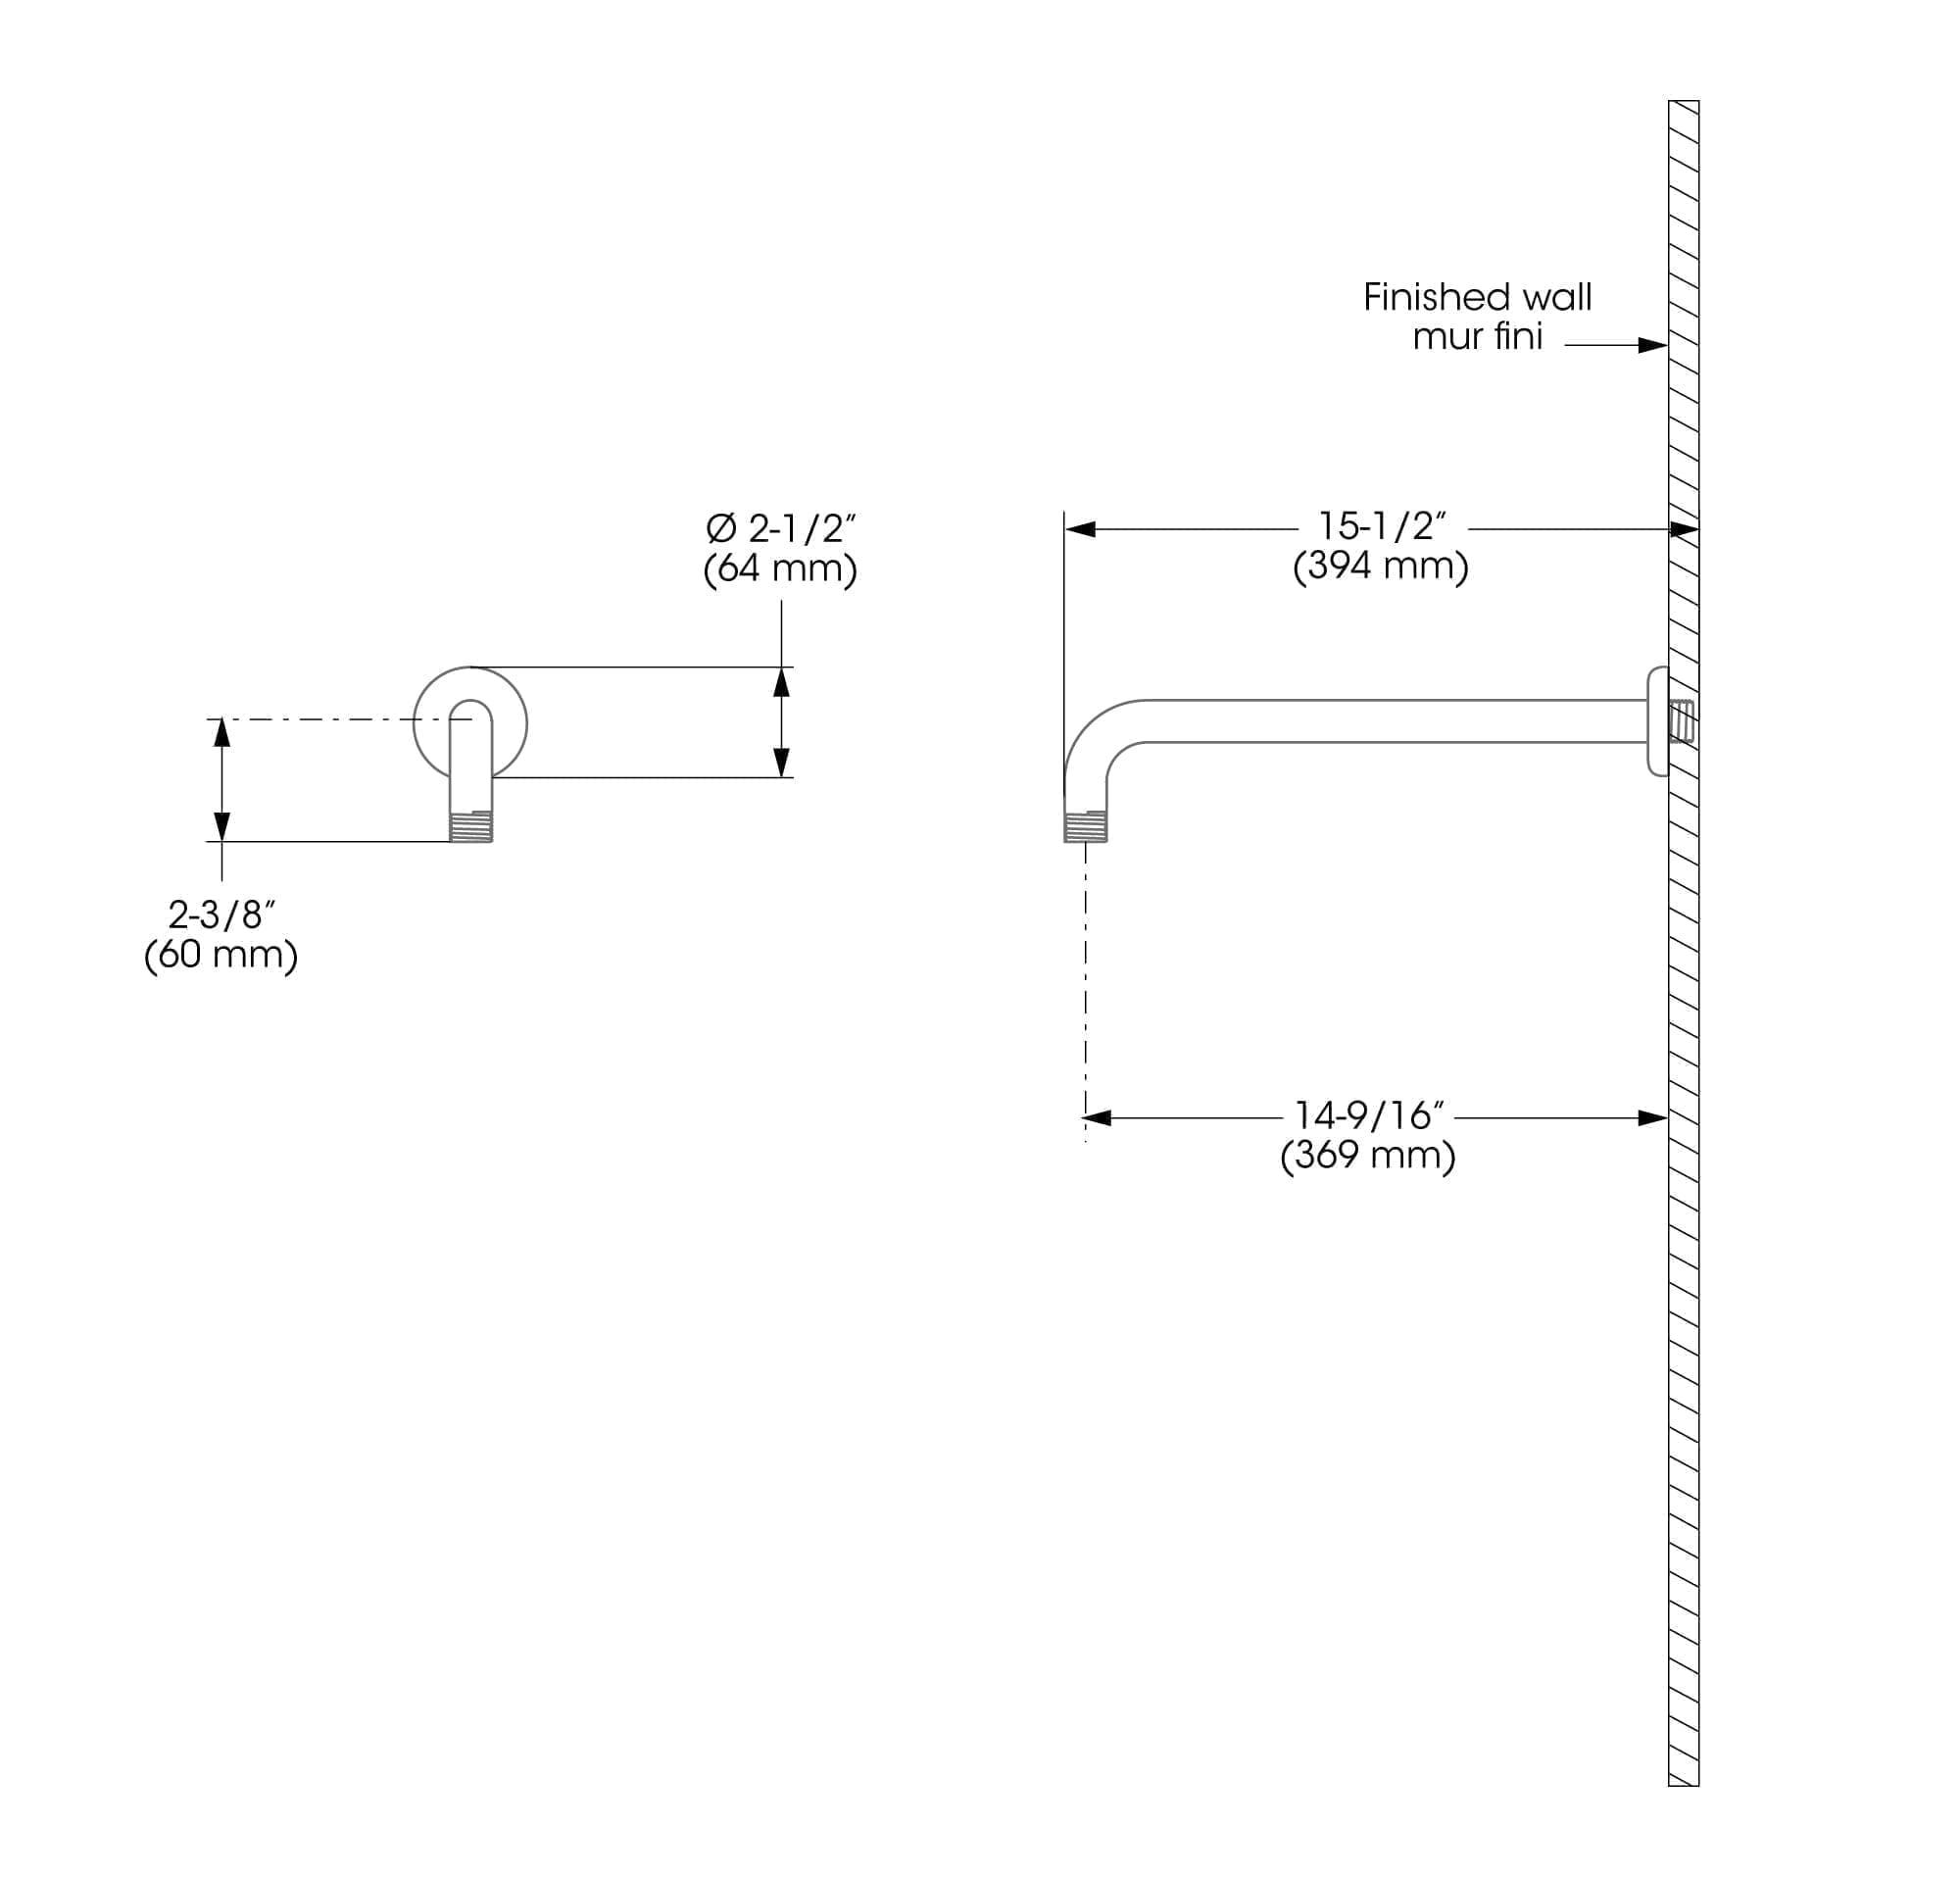 TD_FCDEC0005.jpg - Vue technique